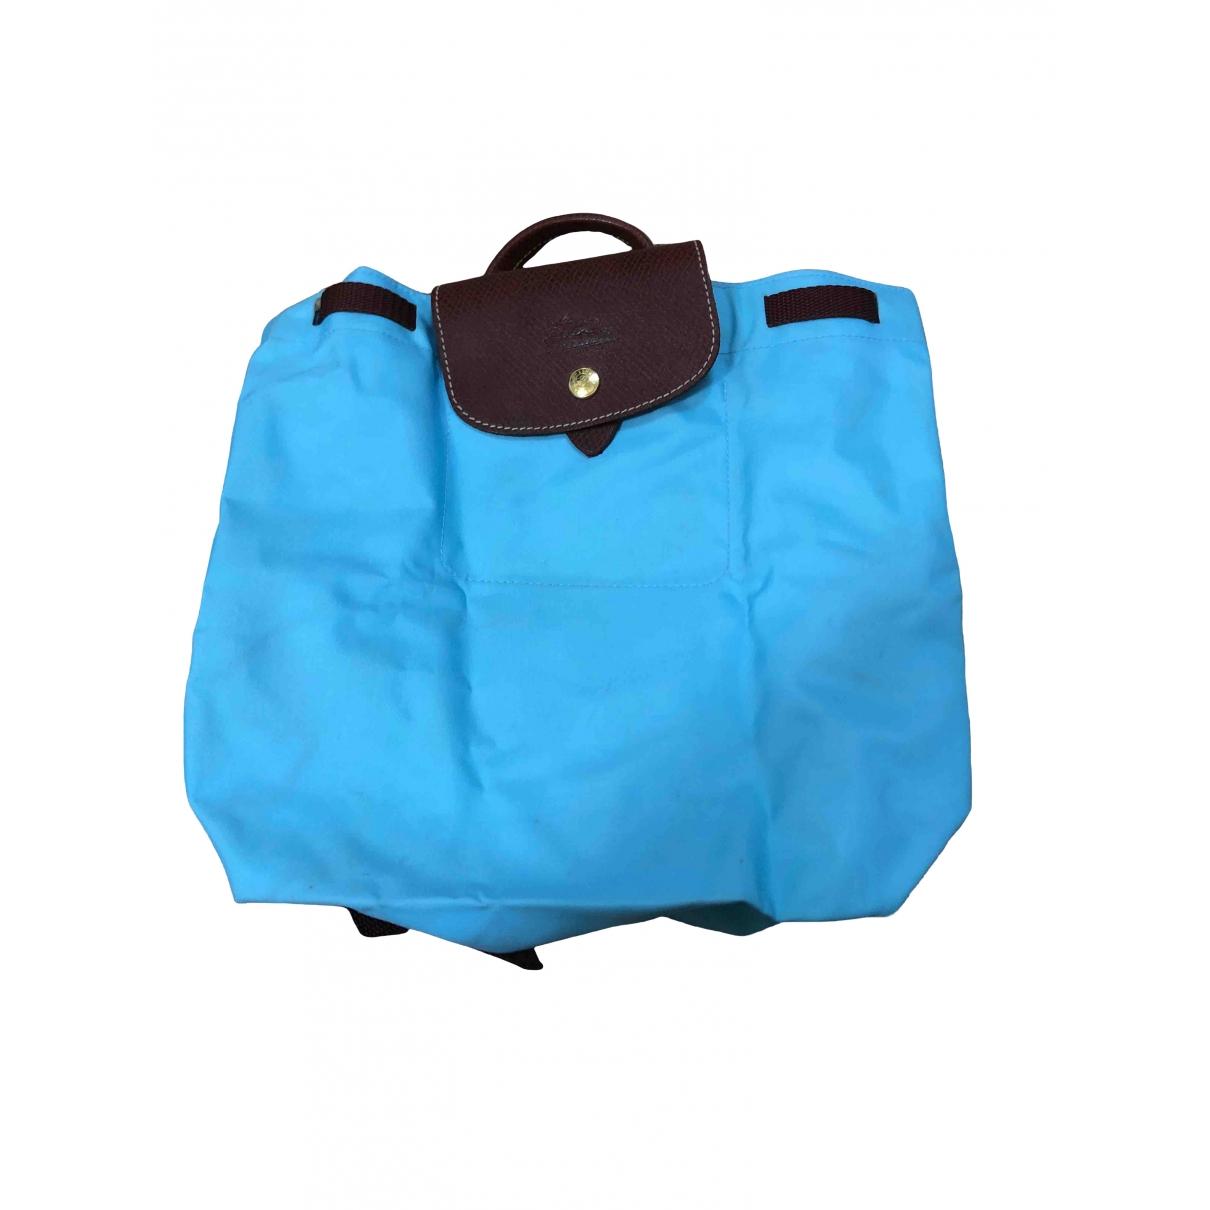 Longchamp \N Blue Cloth handbag for Women \N